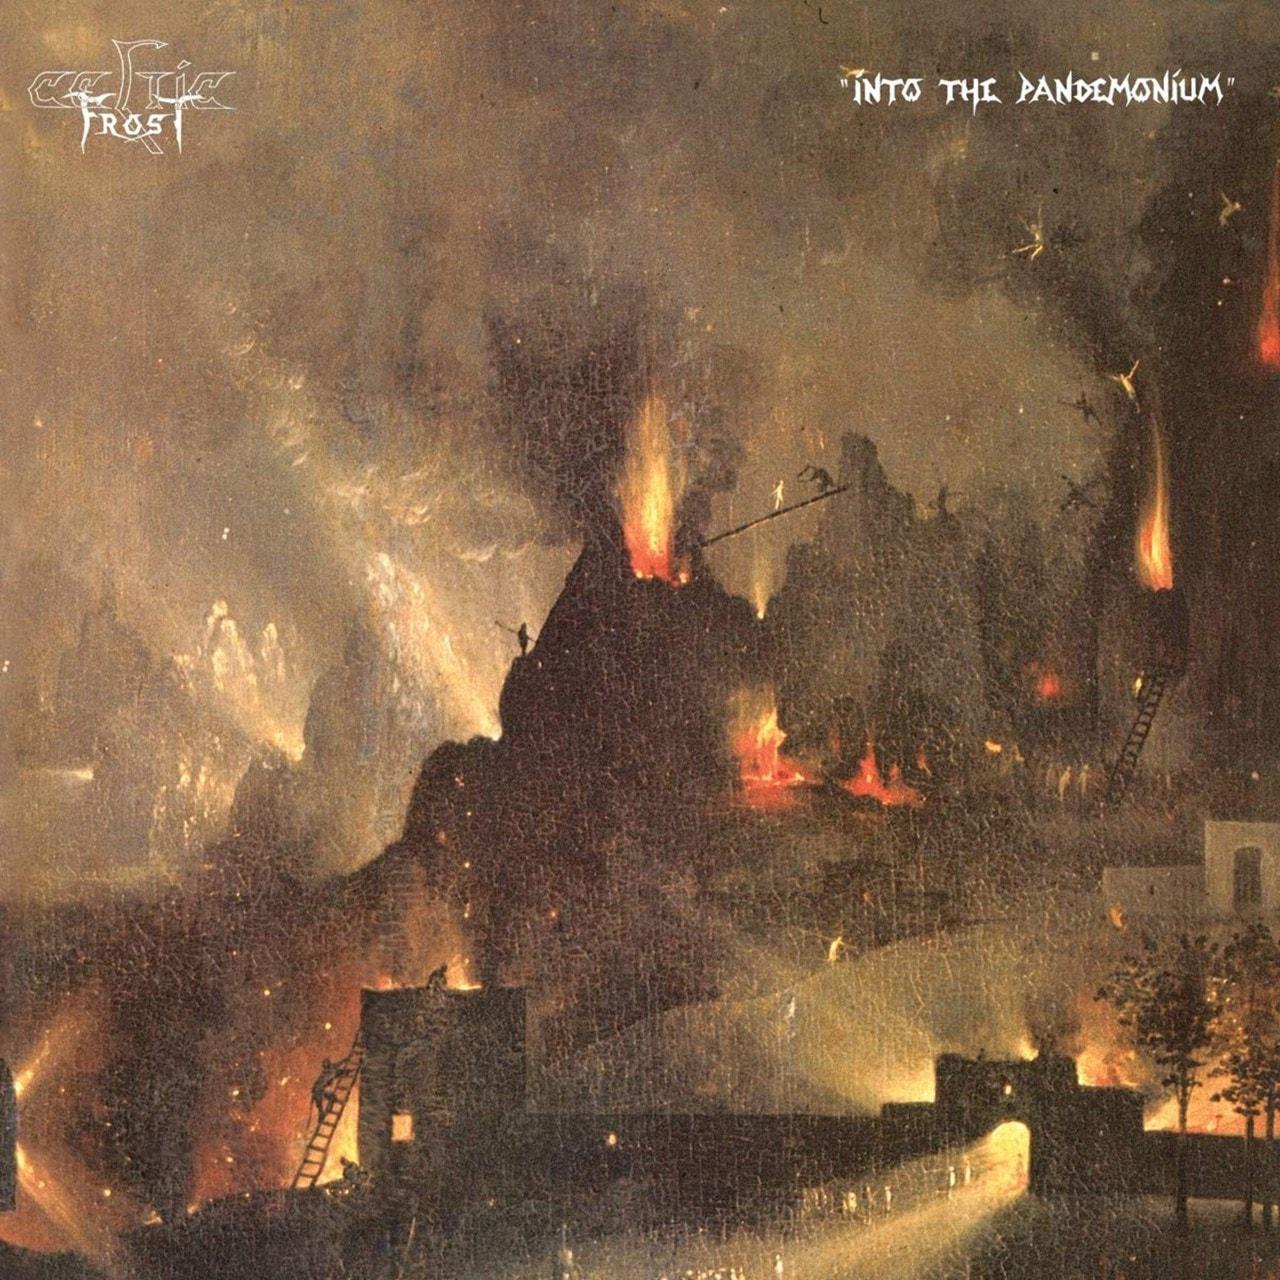 Into the Pandemonium - 1